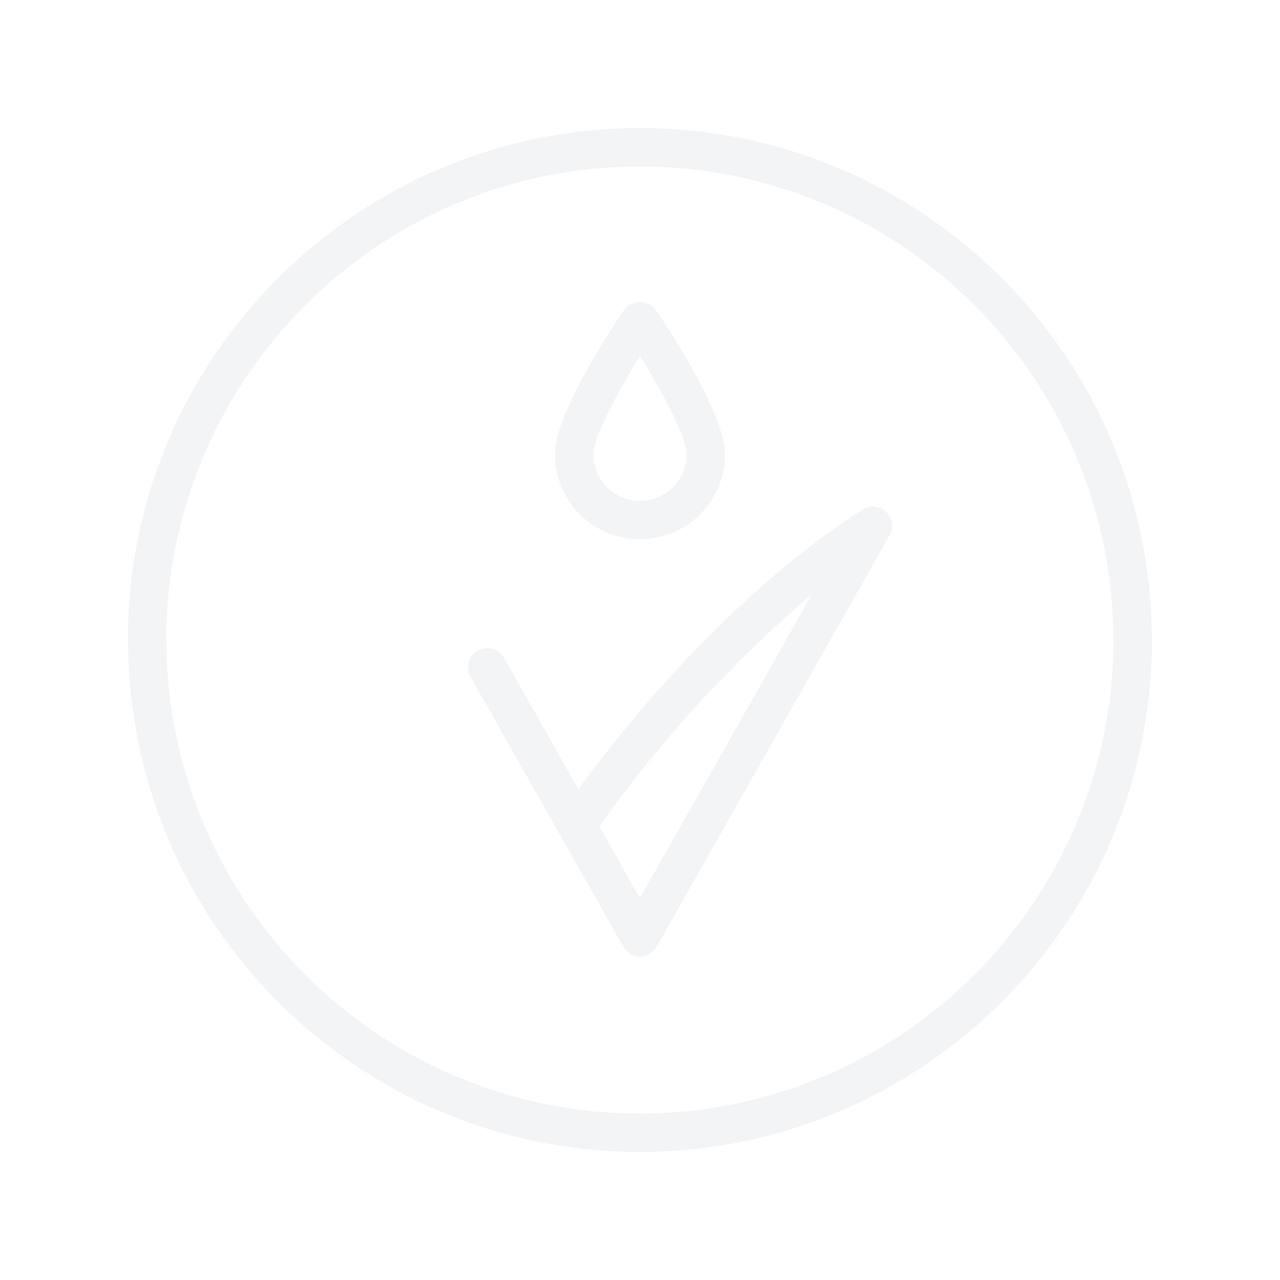 DR. BRONNERS Baby-Mild Pure Castile Soap